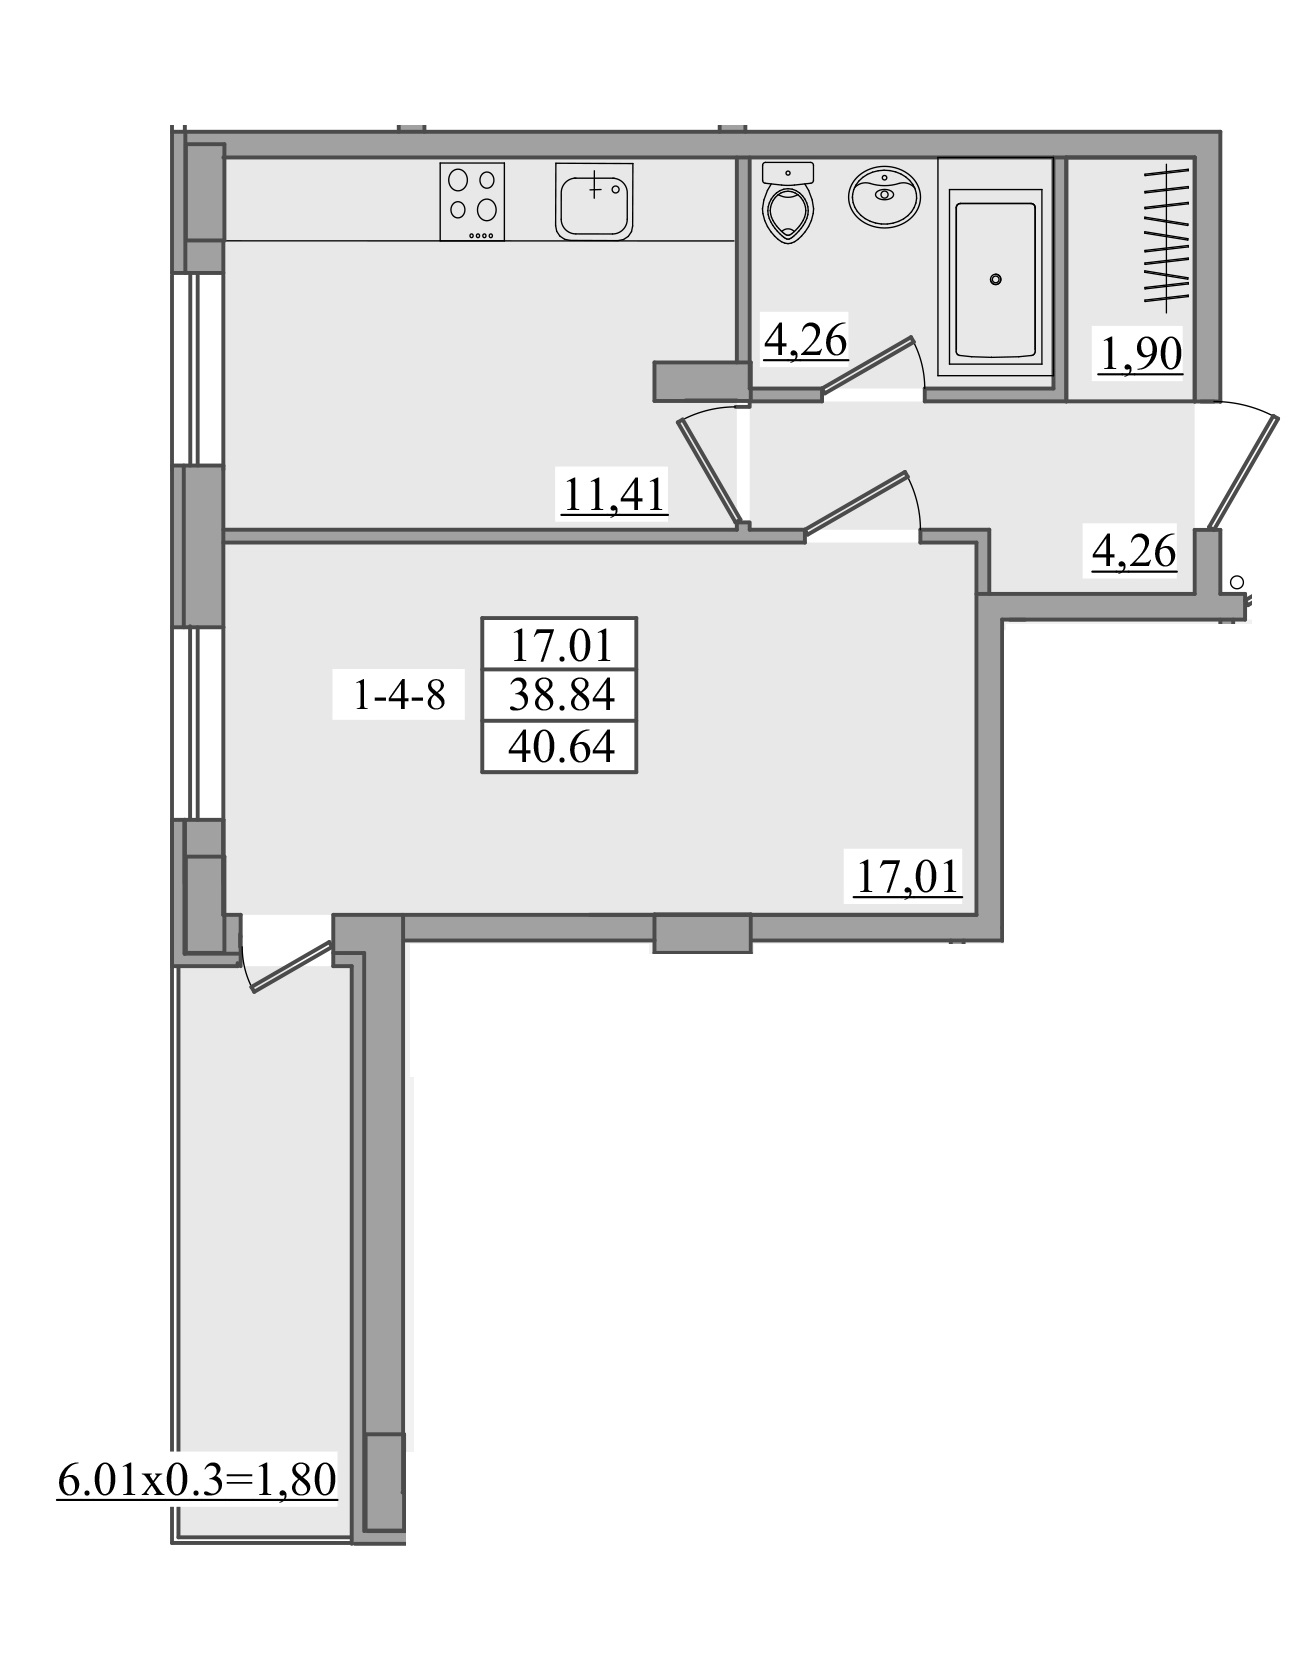 Однокомнатная - ЖК Платинум Резиденс Platinum Residence$38405Площадь:40,64m²